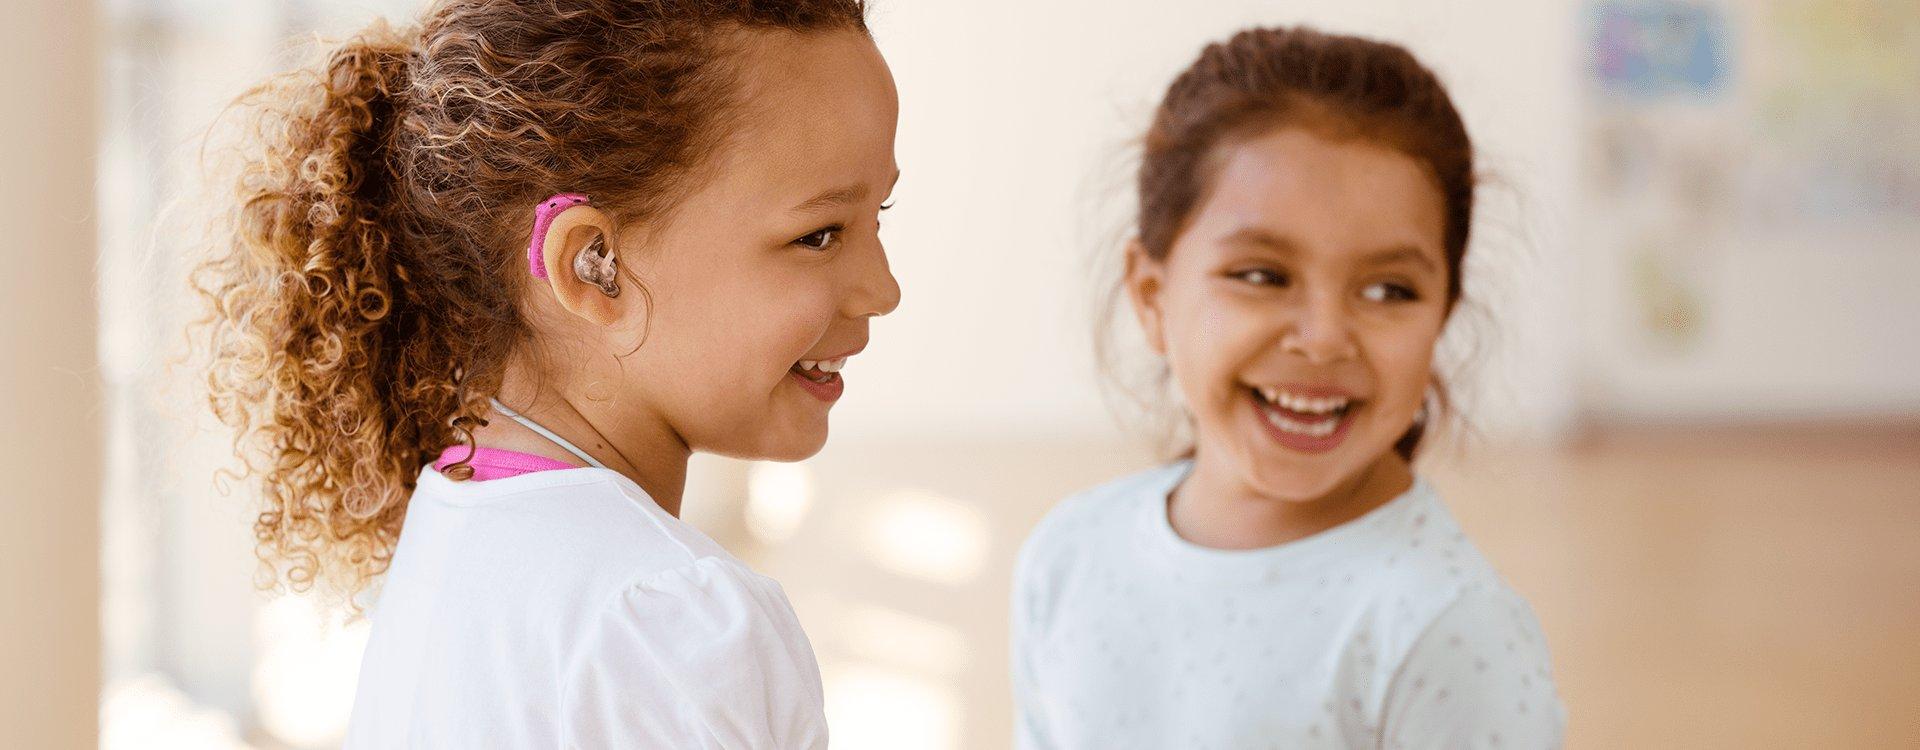 petites filles portant appareil auditif rigolent -adaptation bimodale